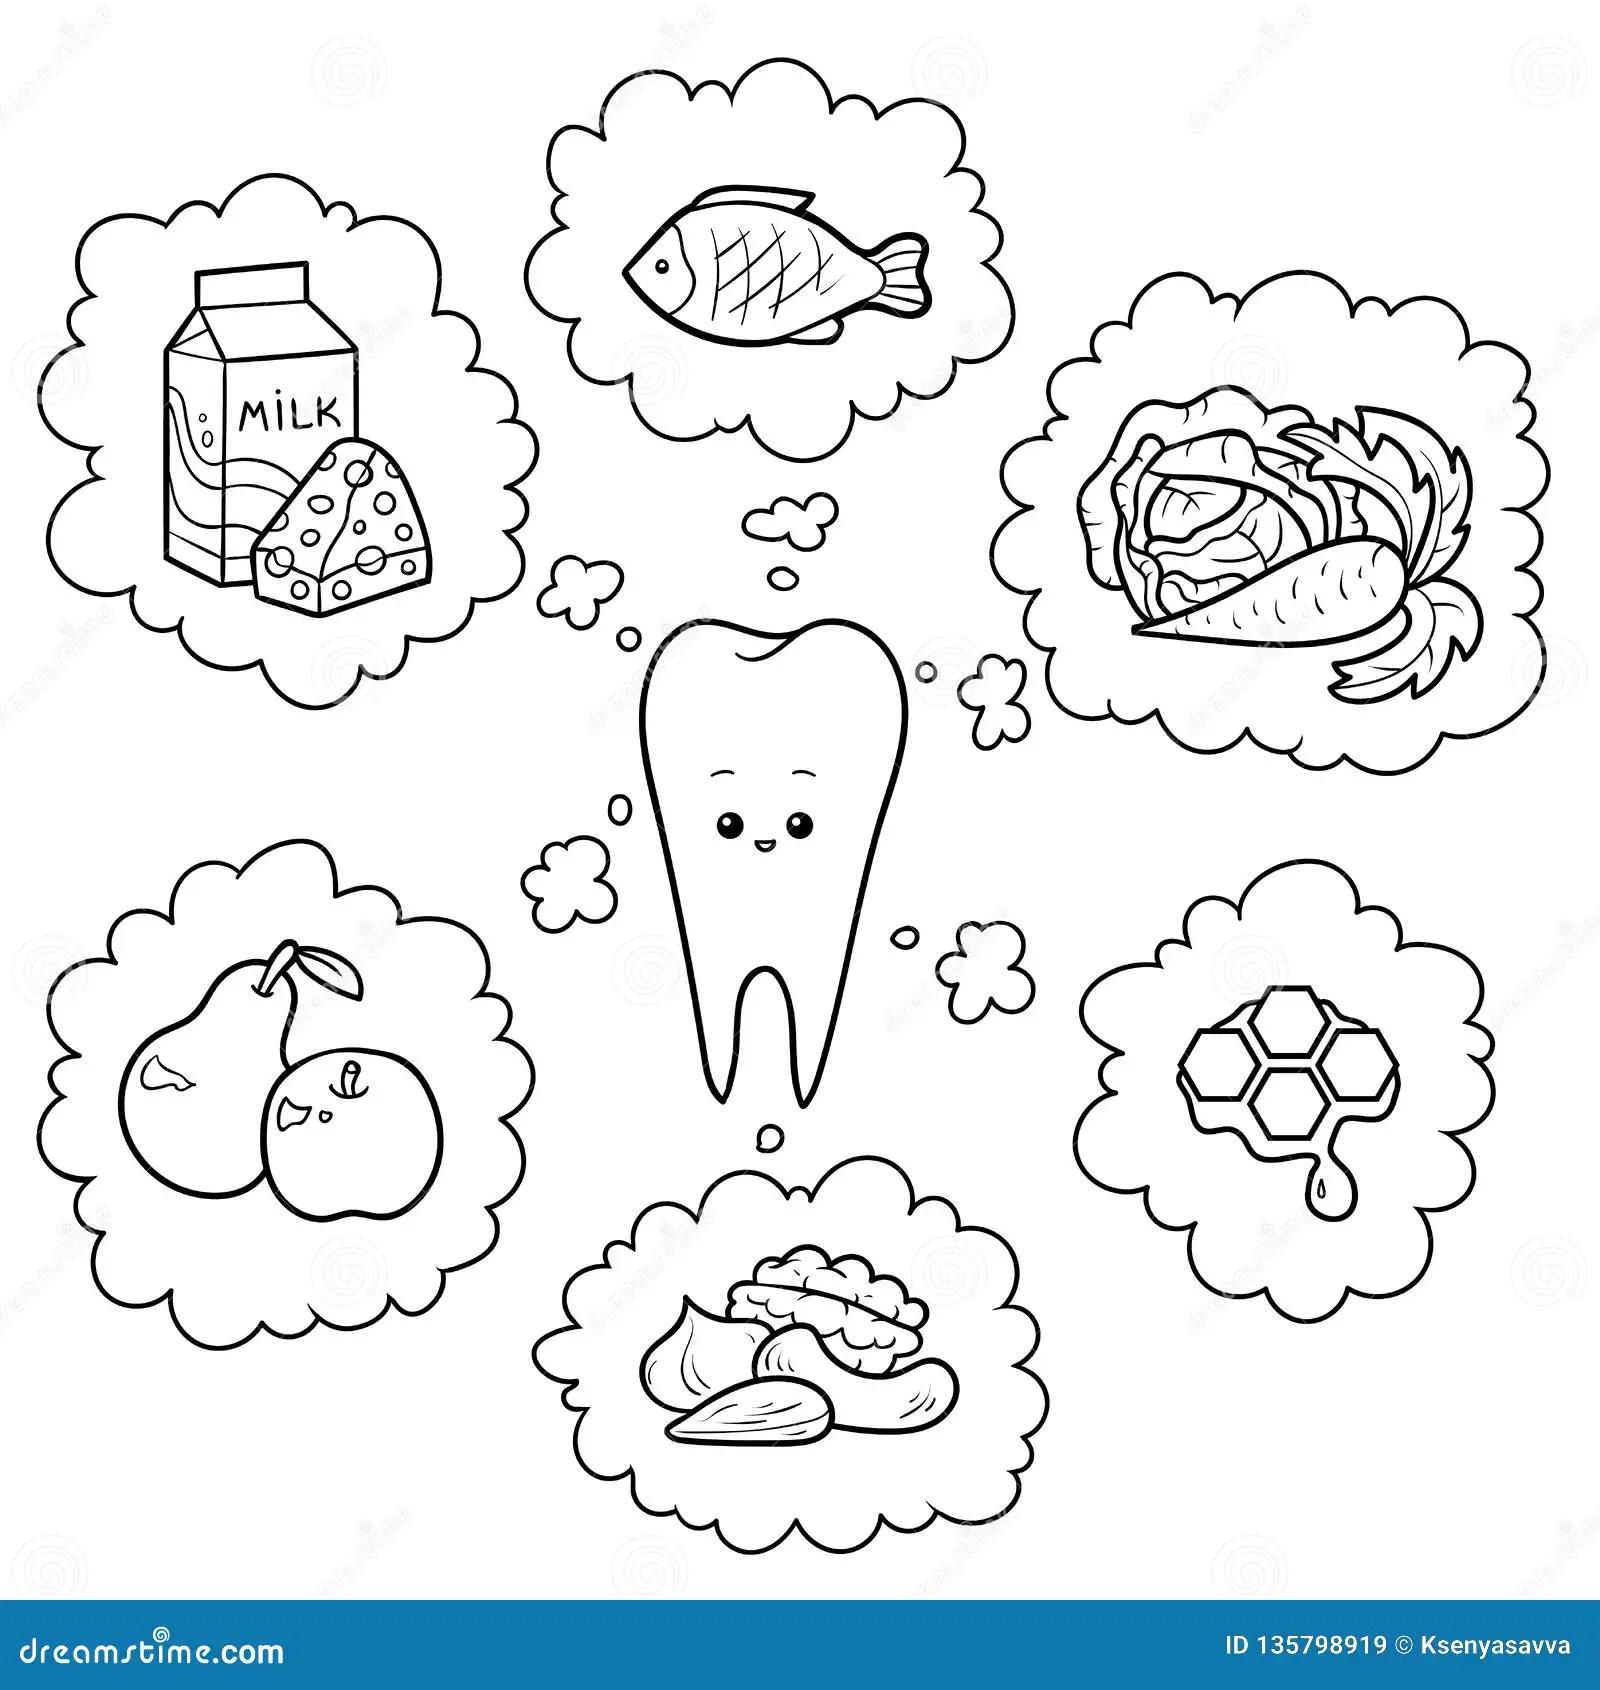 Black And White Cartoon Illustration Good Food For Teeth